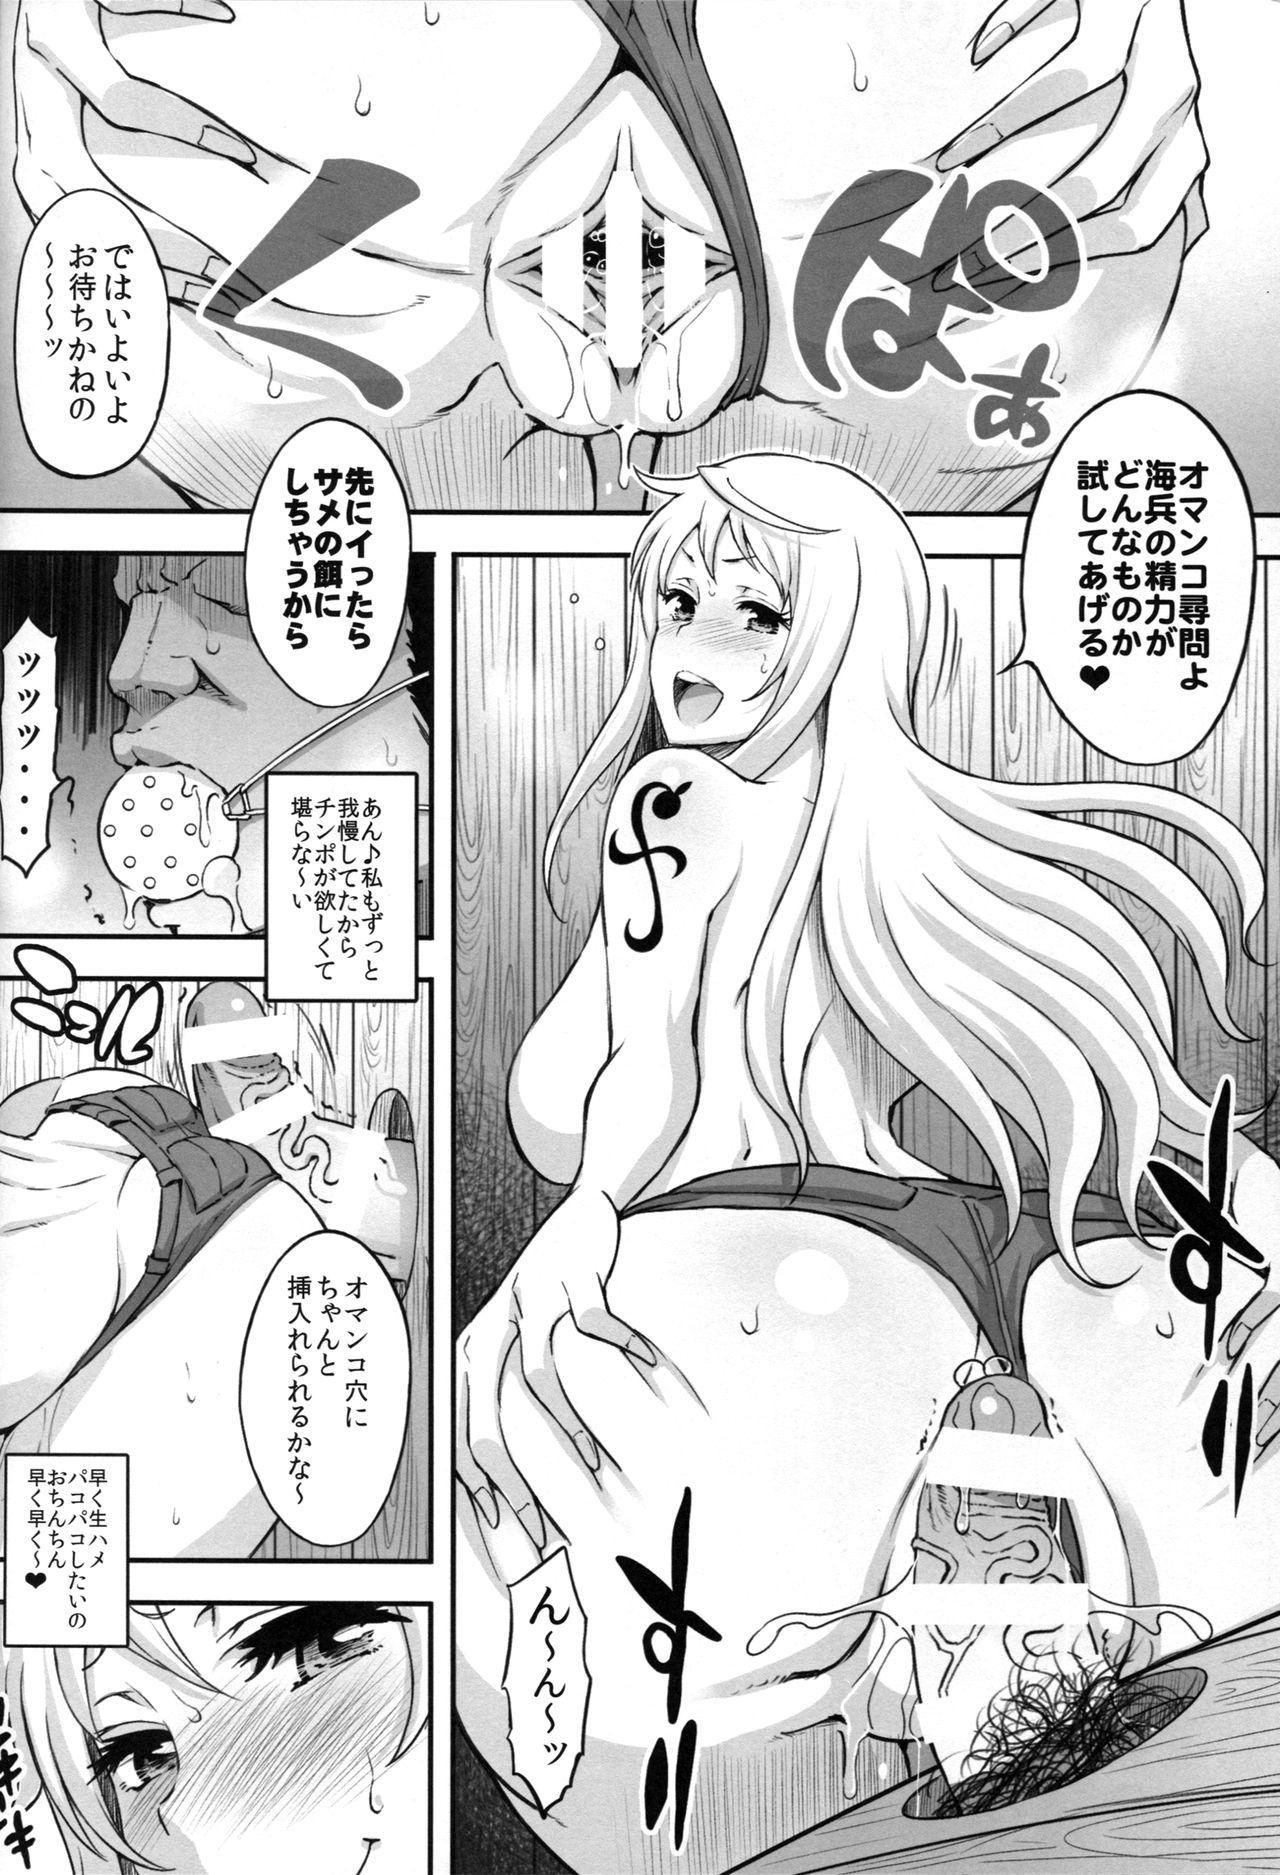 Rakuen Onna Kaizoku 5 - Women Pirate in Paradise 12